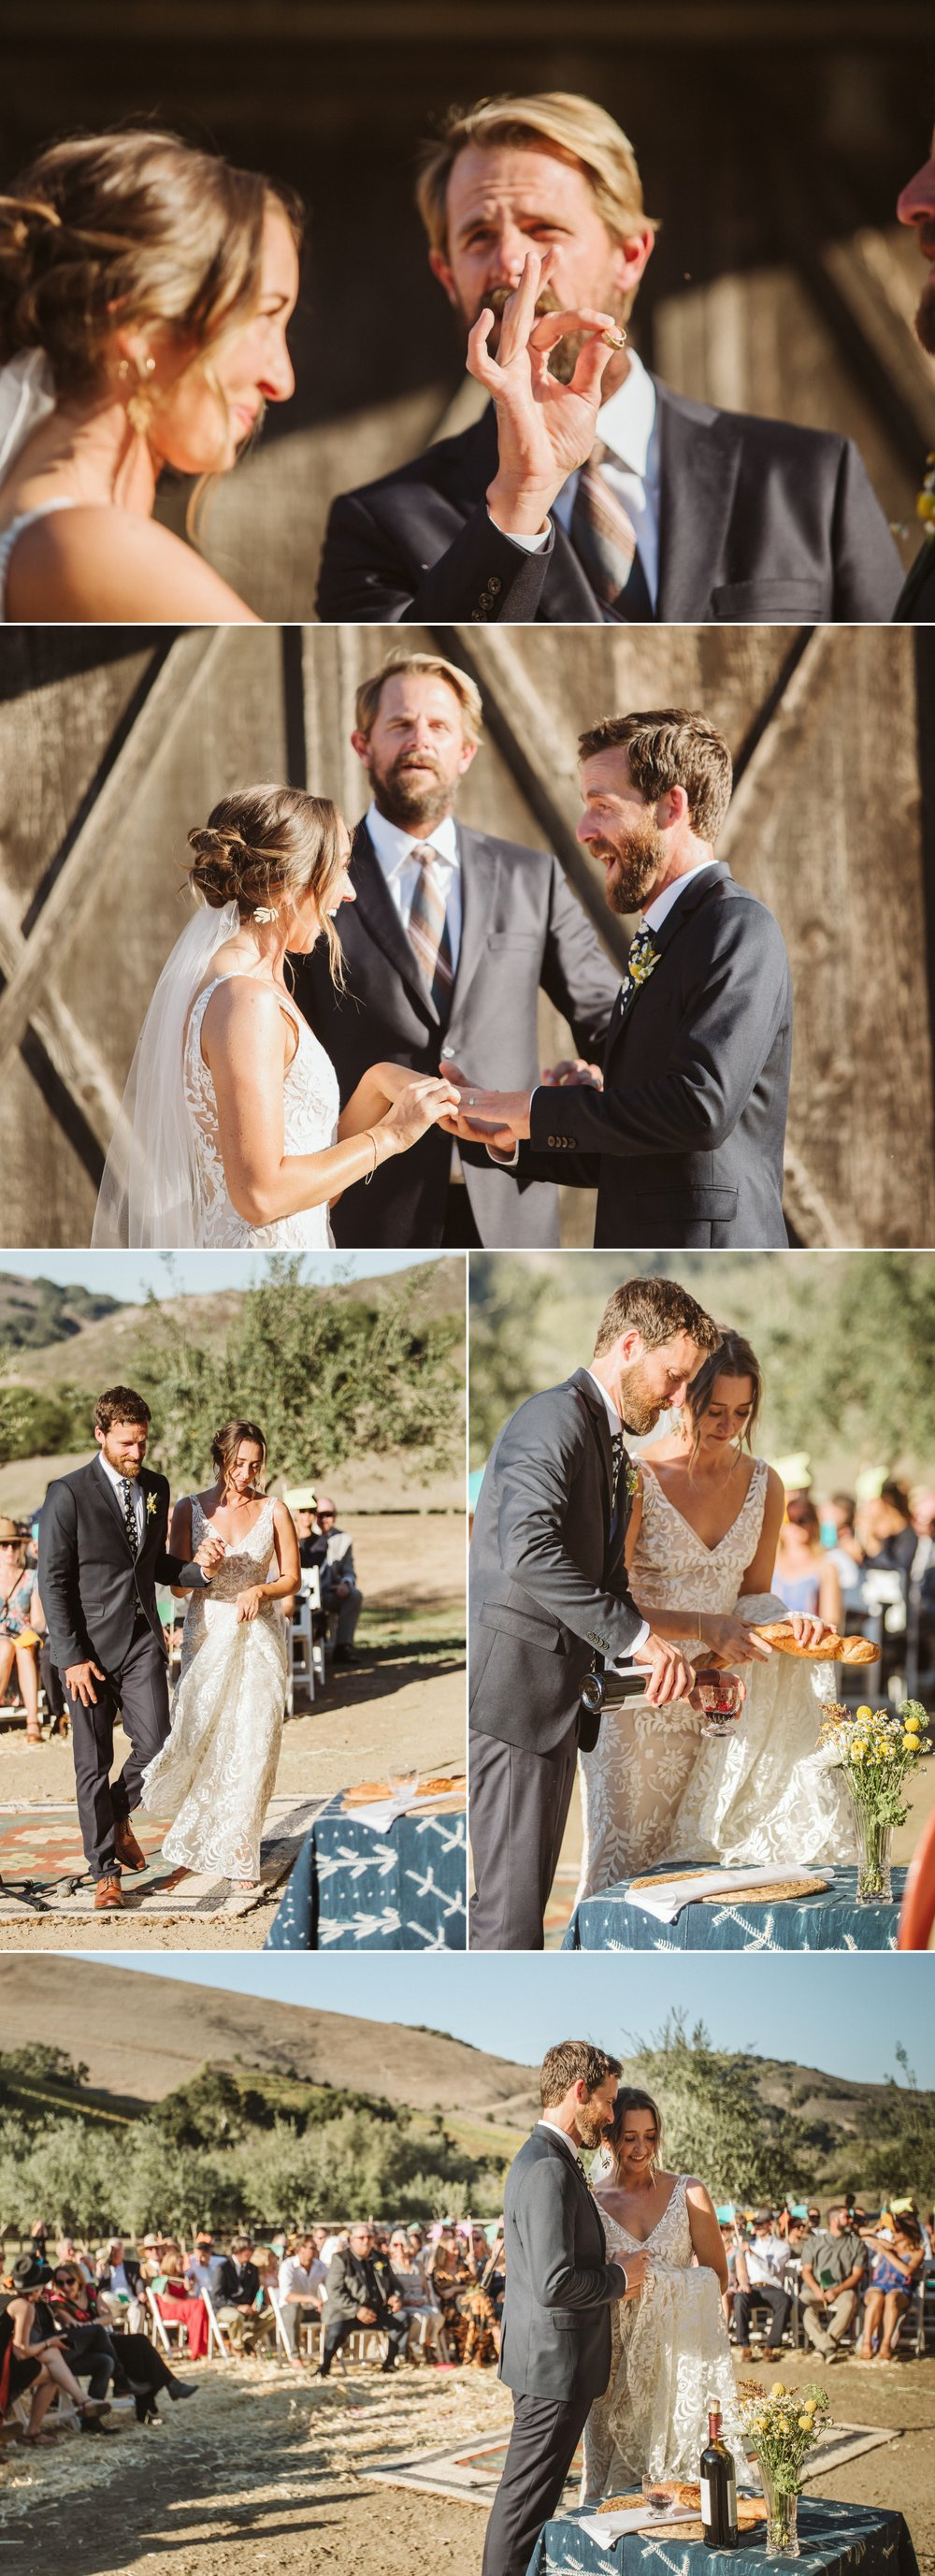 Colorful Barn Wedding at Jalama Canon Ranch- Lompoc- Santa Barbara- Geoff & Lauren 19.jpg